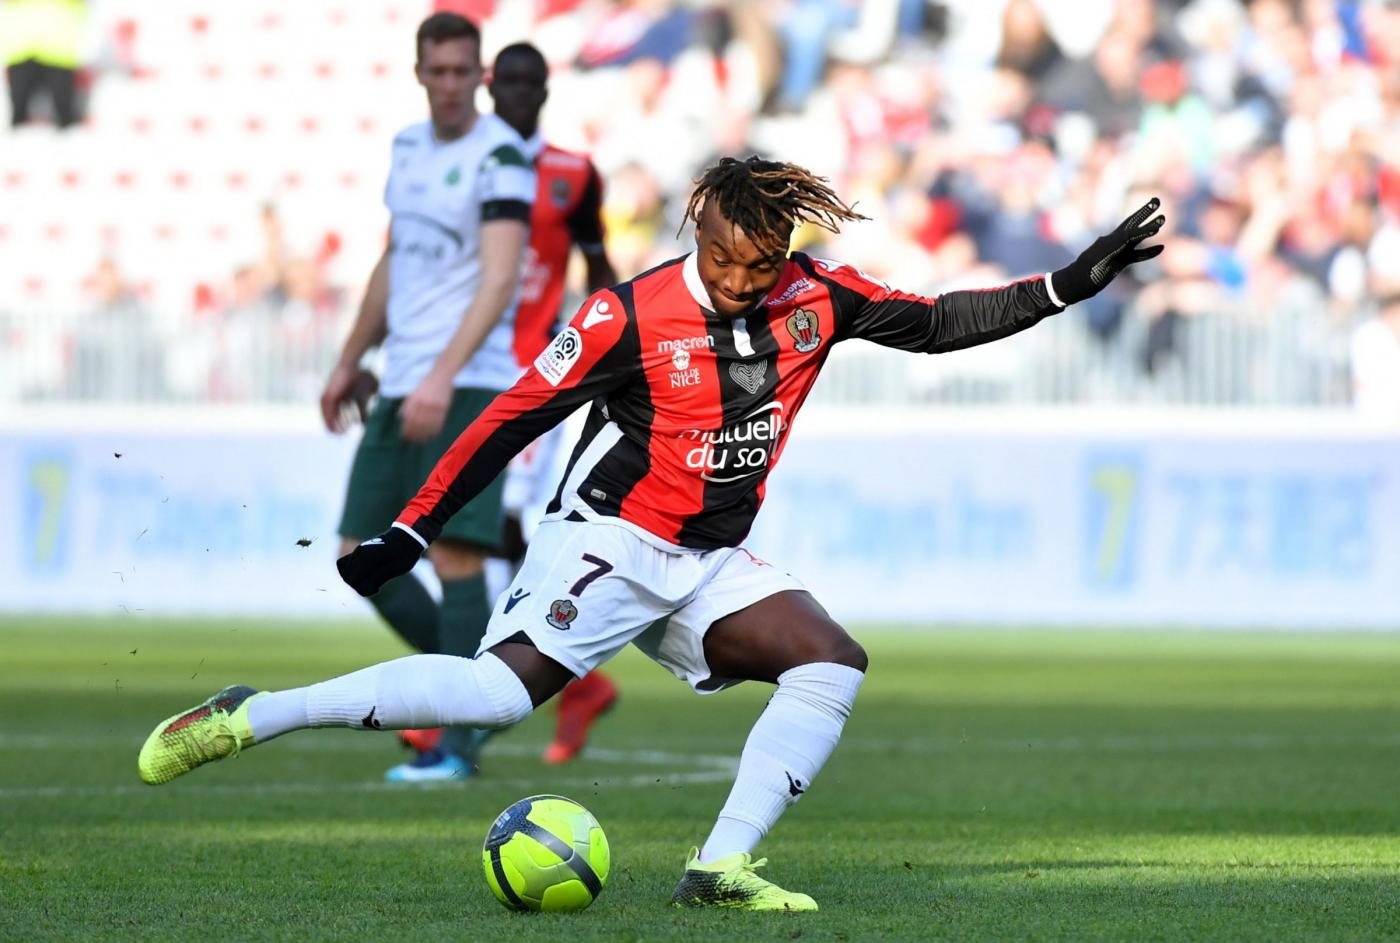 Nizza-Nantes 18 febbraio, analisi e pronostico Ligue giornata 26